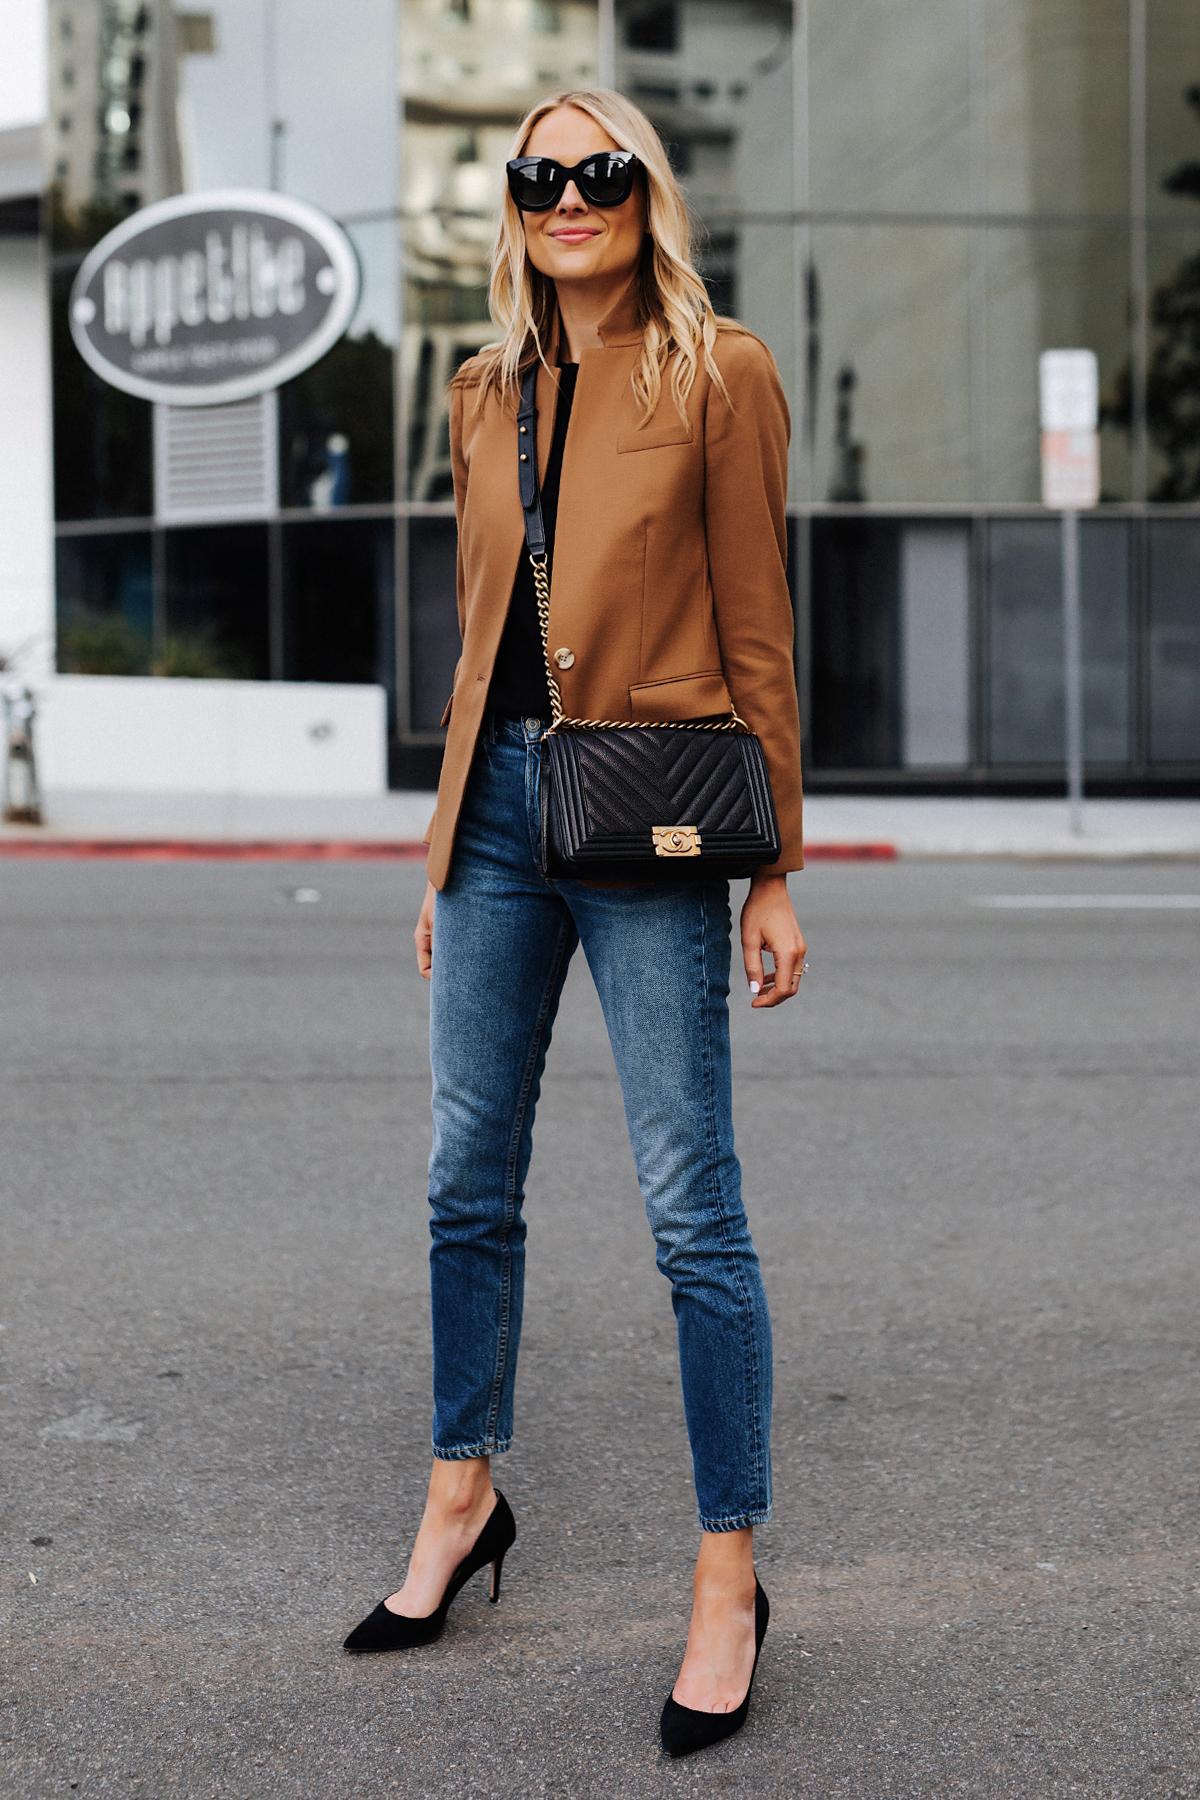 How to Buy a Discounted Chanel Handbag on eBay Fashion